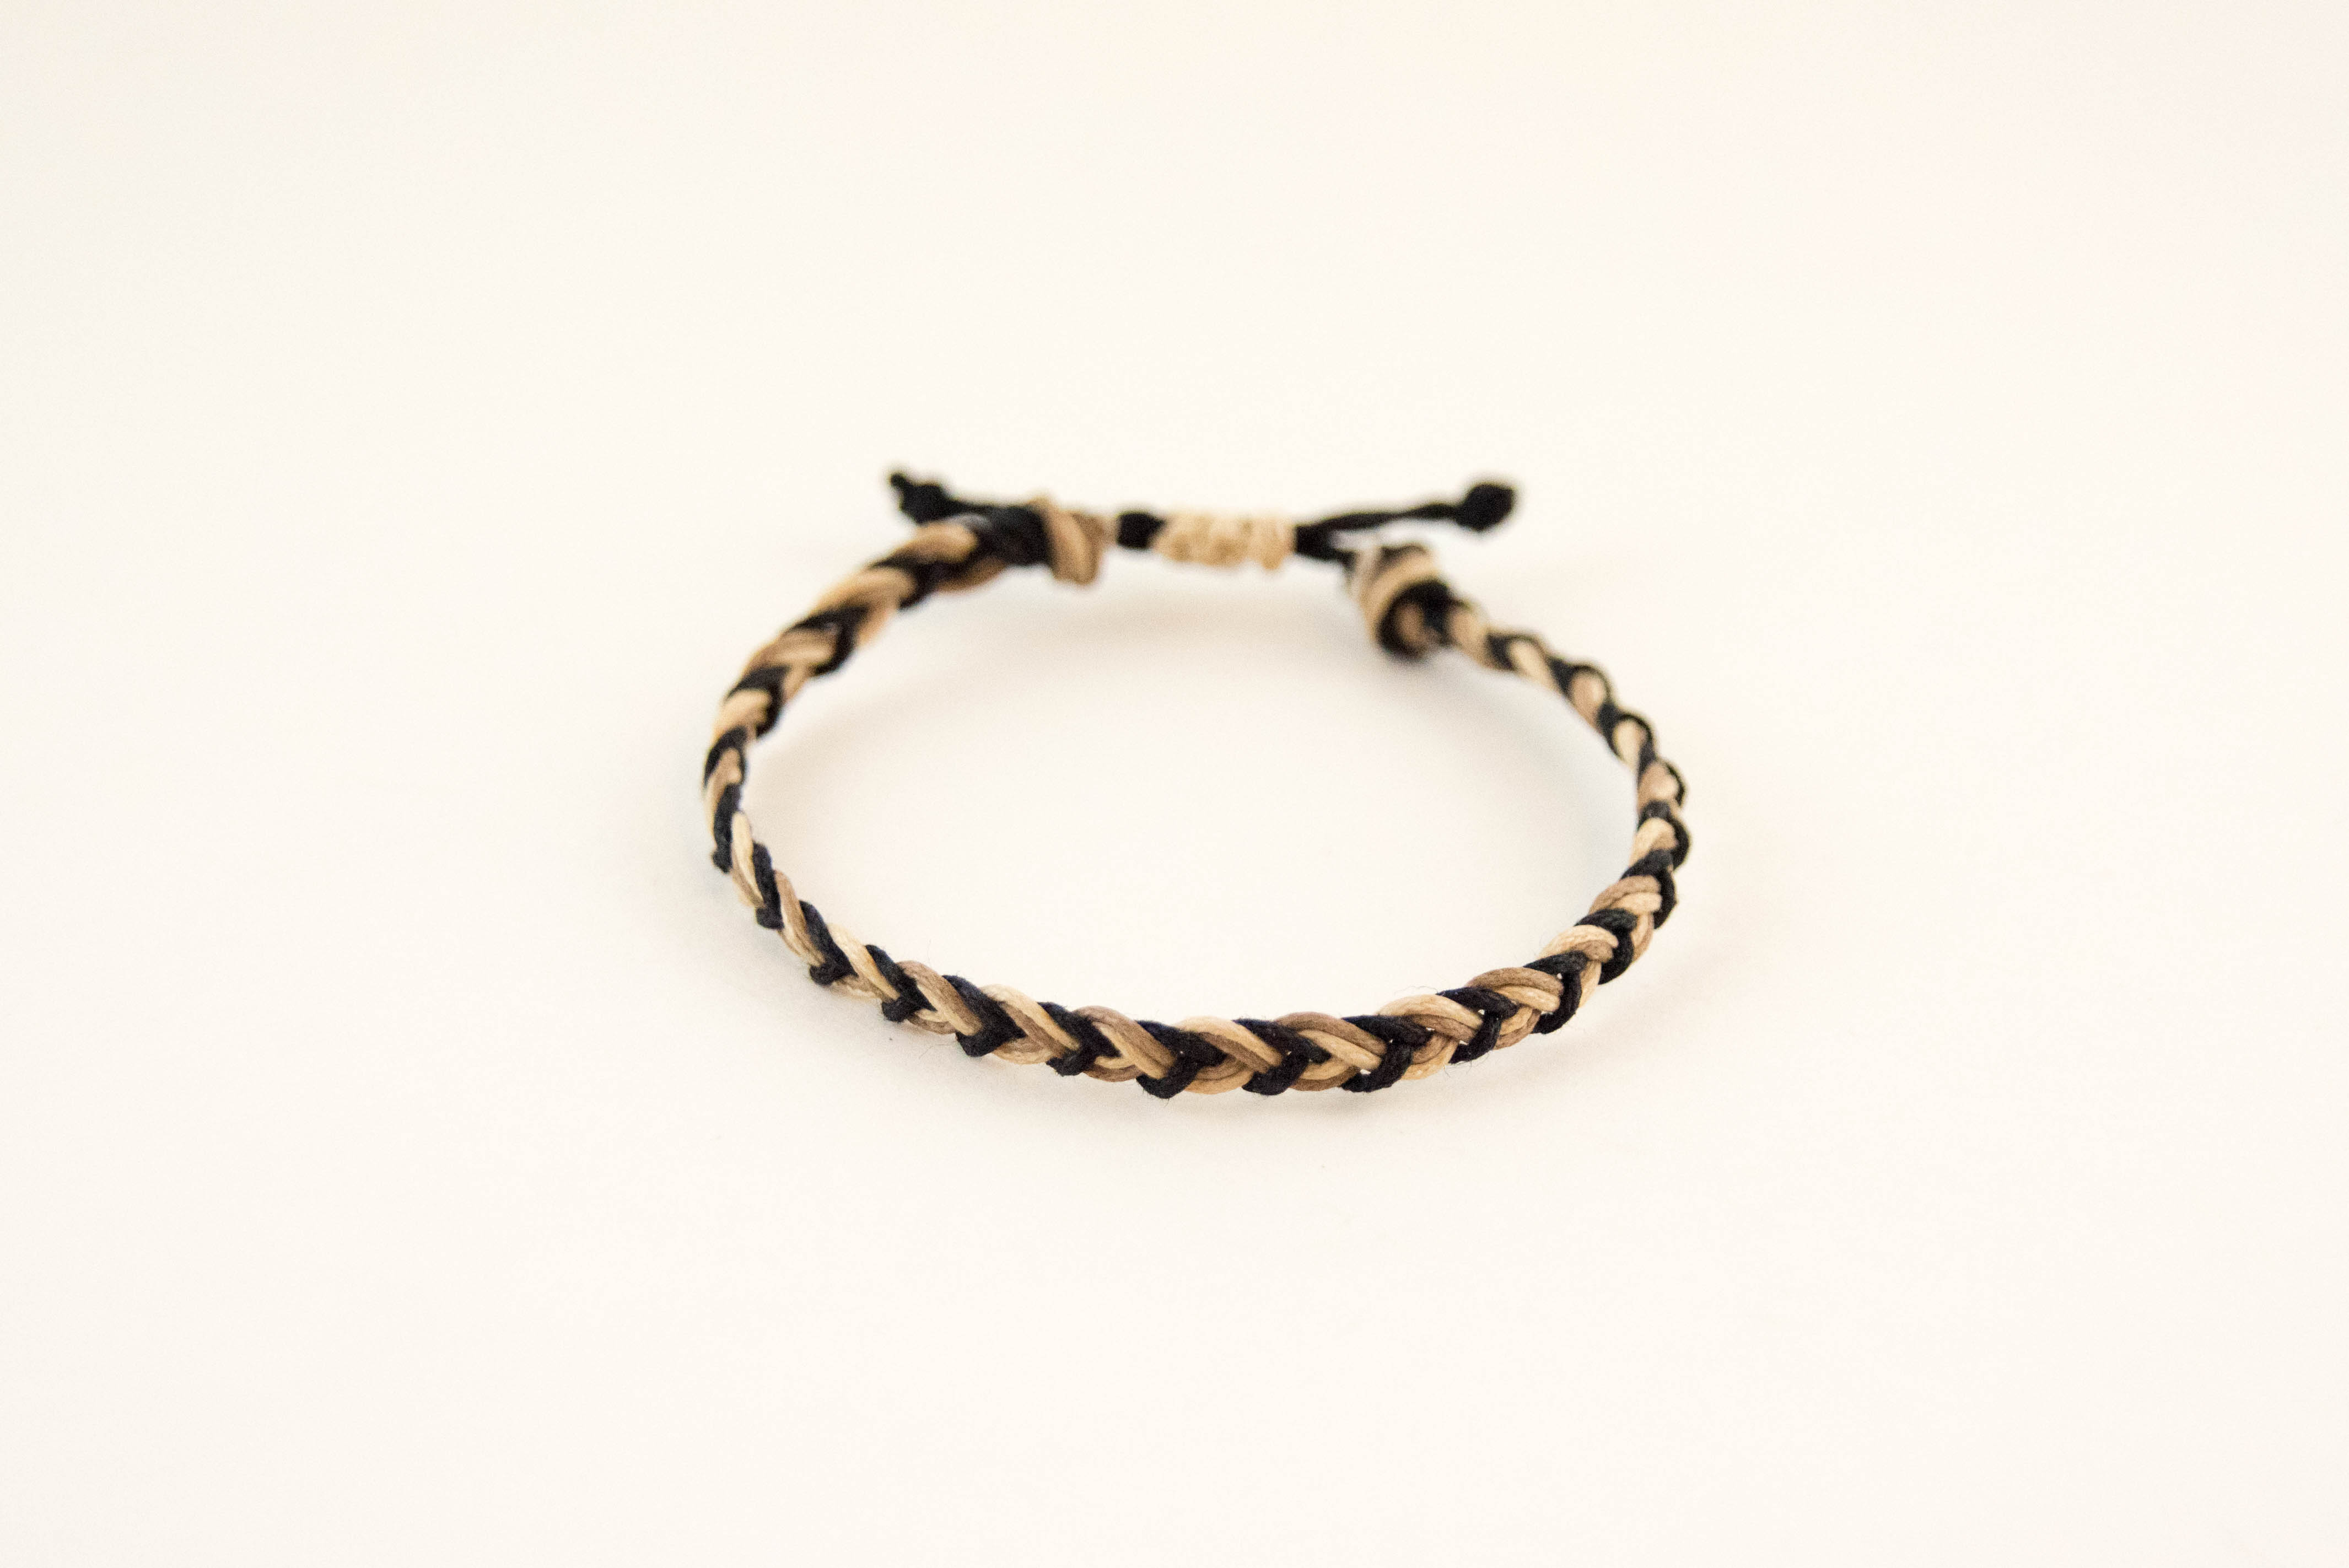 diy macrame braided friendship bracelet likely by sea. Black Bedroom Furniture Sets. Home Design Ideas